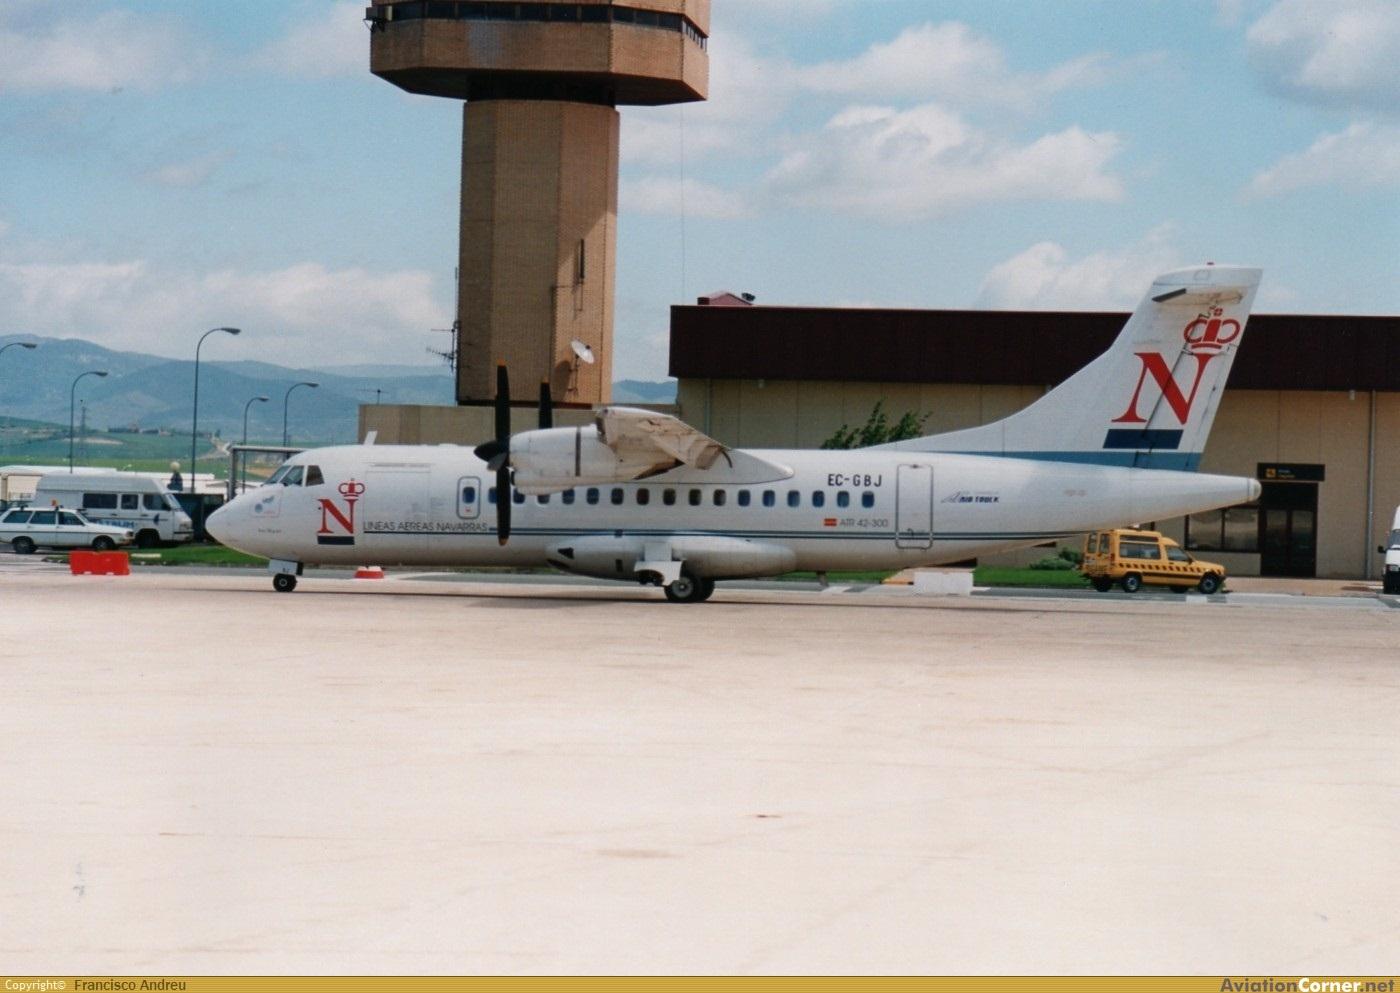 AviationCorner.net - Fotografía aeronáutica - ATR 42-320